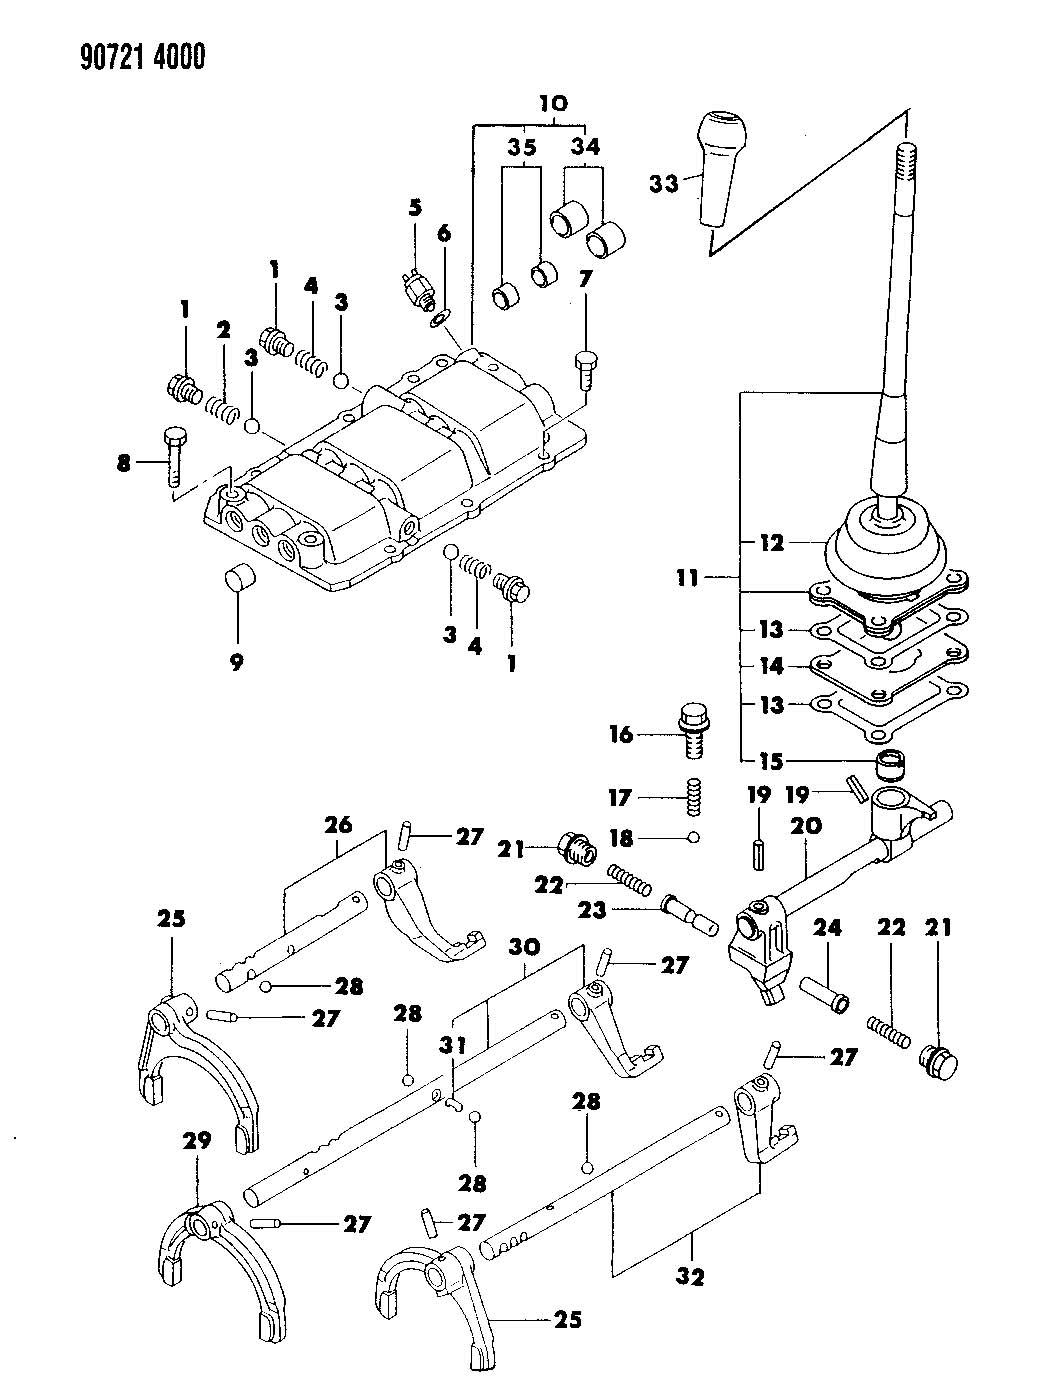 Chrysler Grand Voyager Bolt. Hex flange head. M8x45